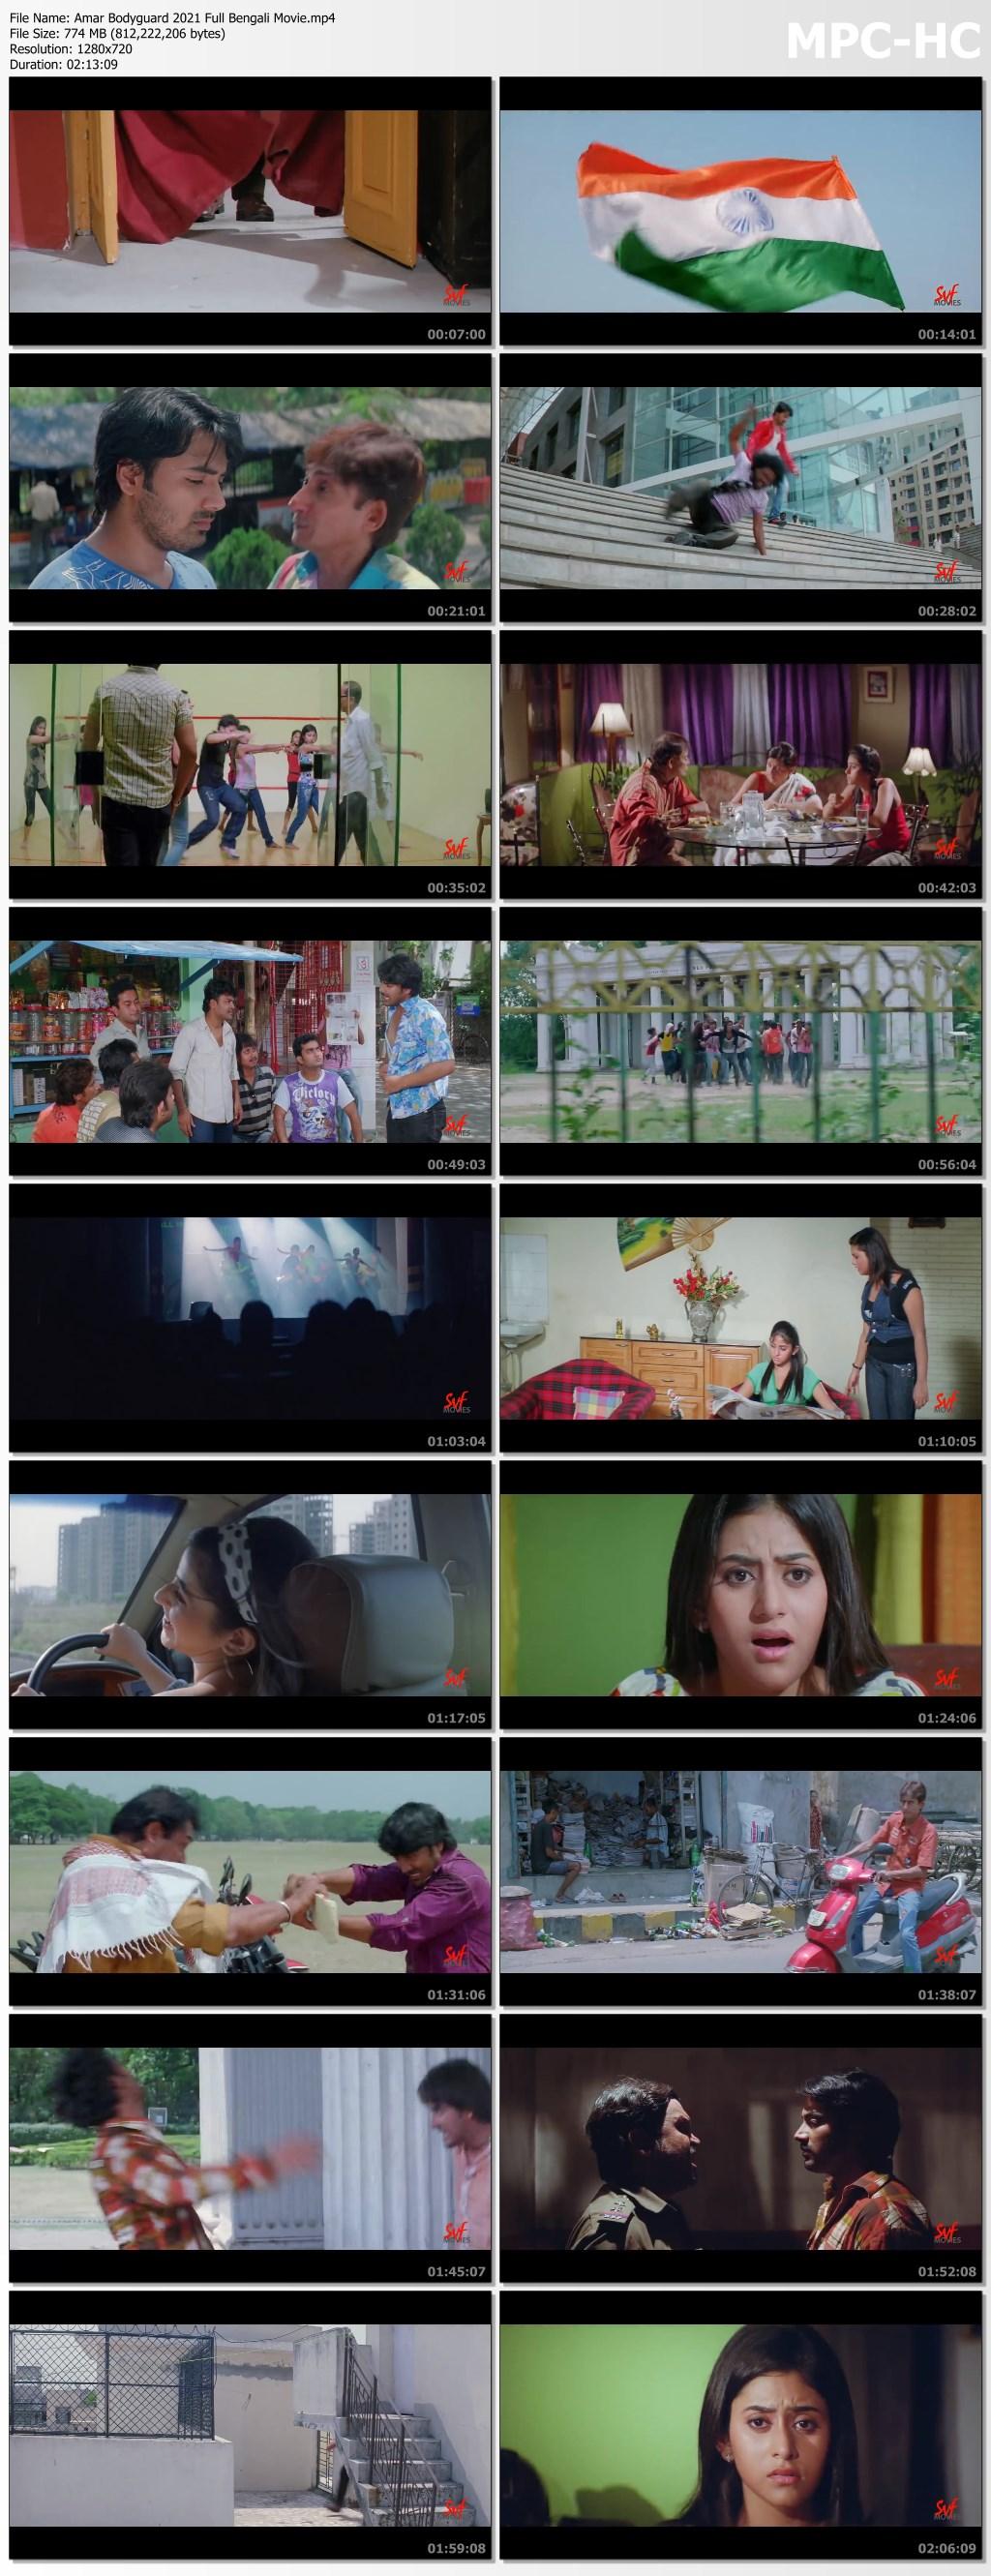 Amar Bodyguard 2021 Full Bengali Movie.mp4 thumbs